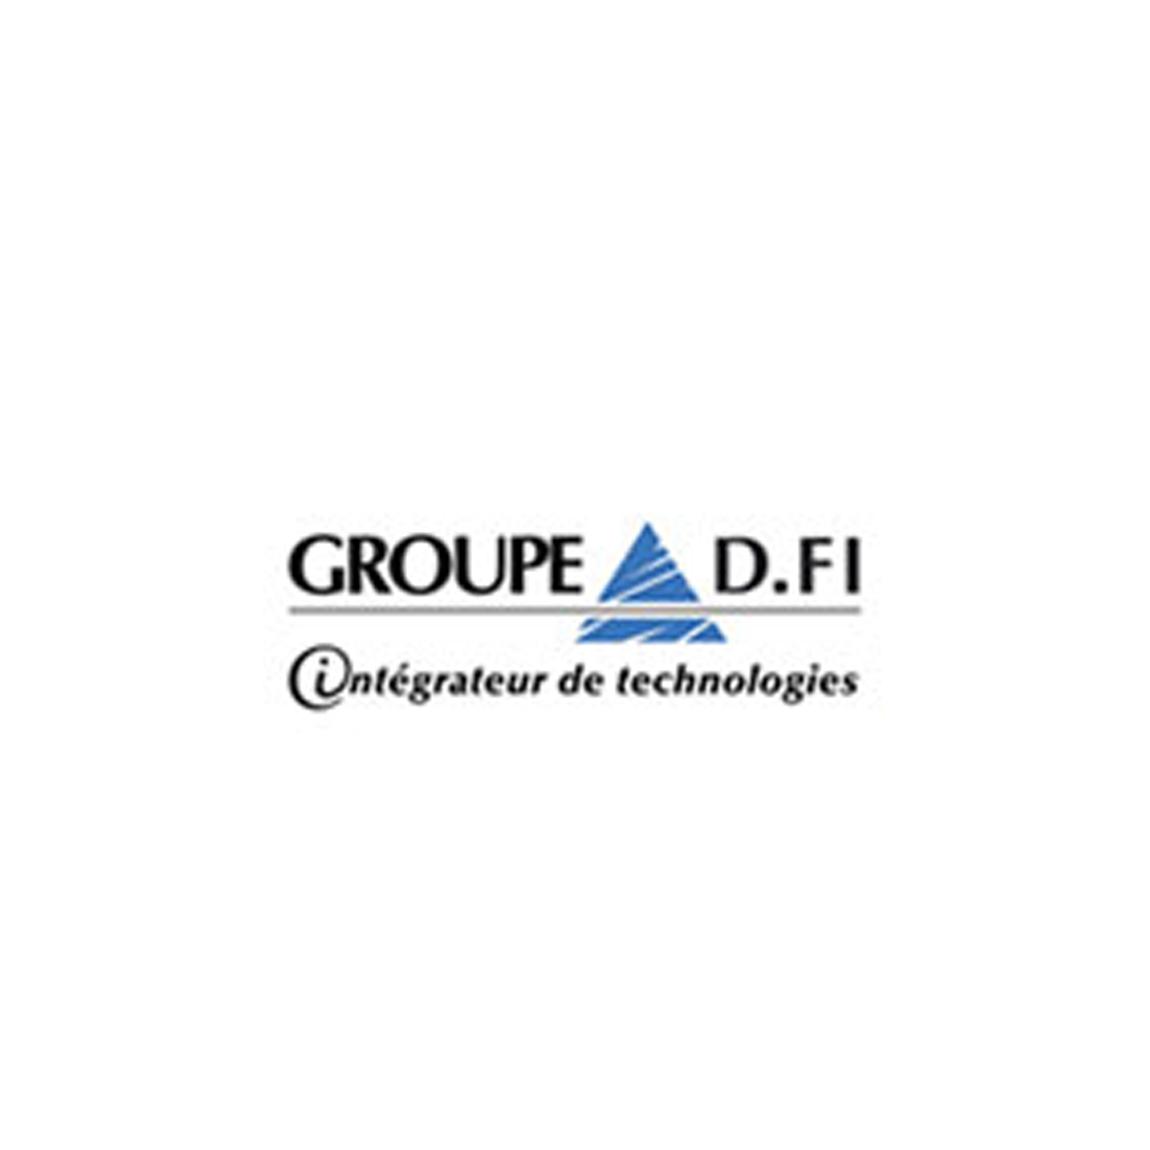 Groupe DFI